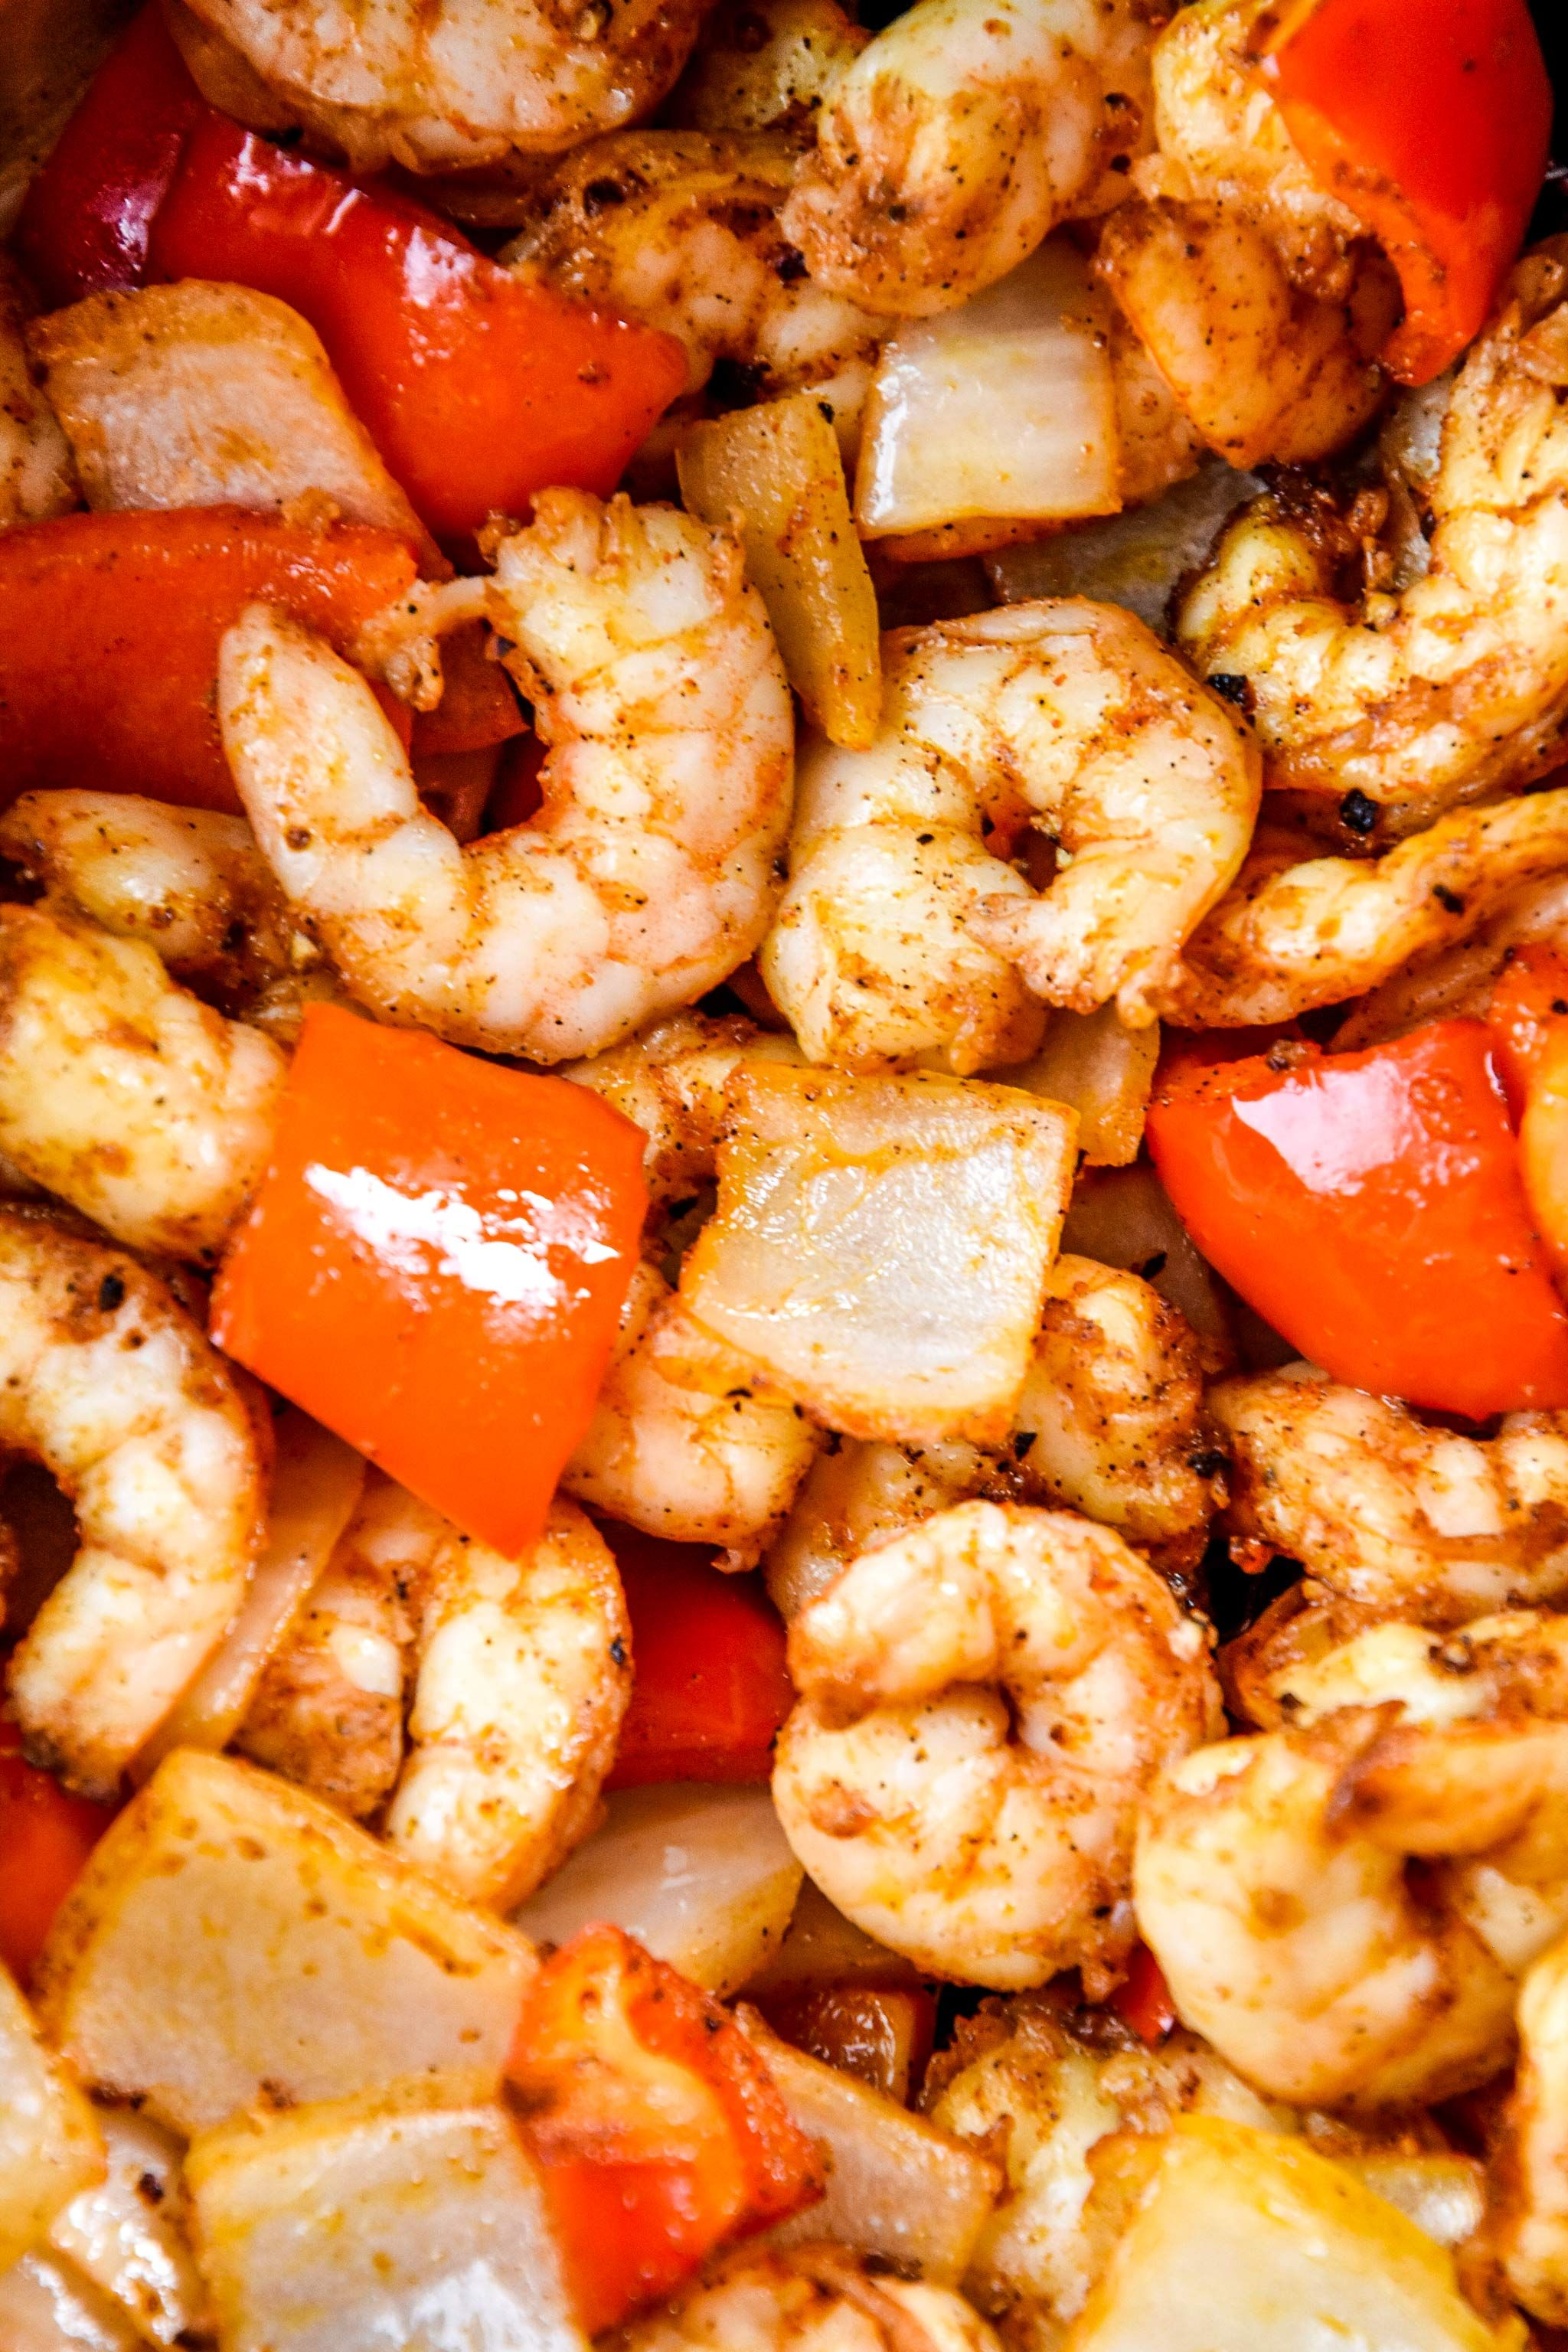 Easy Air Fryer Shrimp & Vegetables Recipe Cooking raw